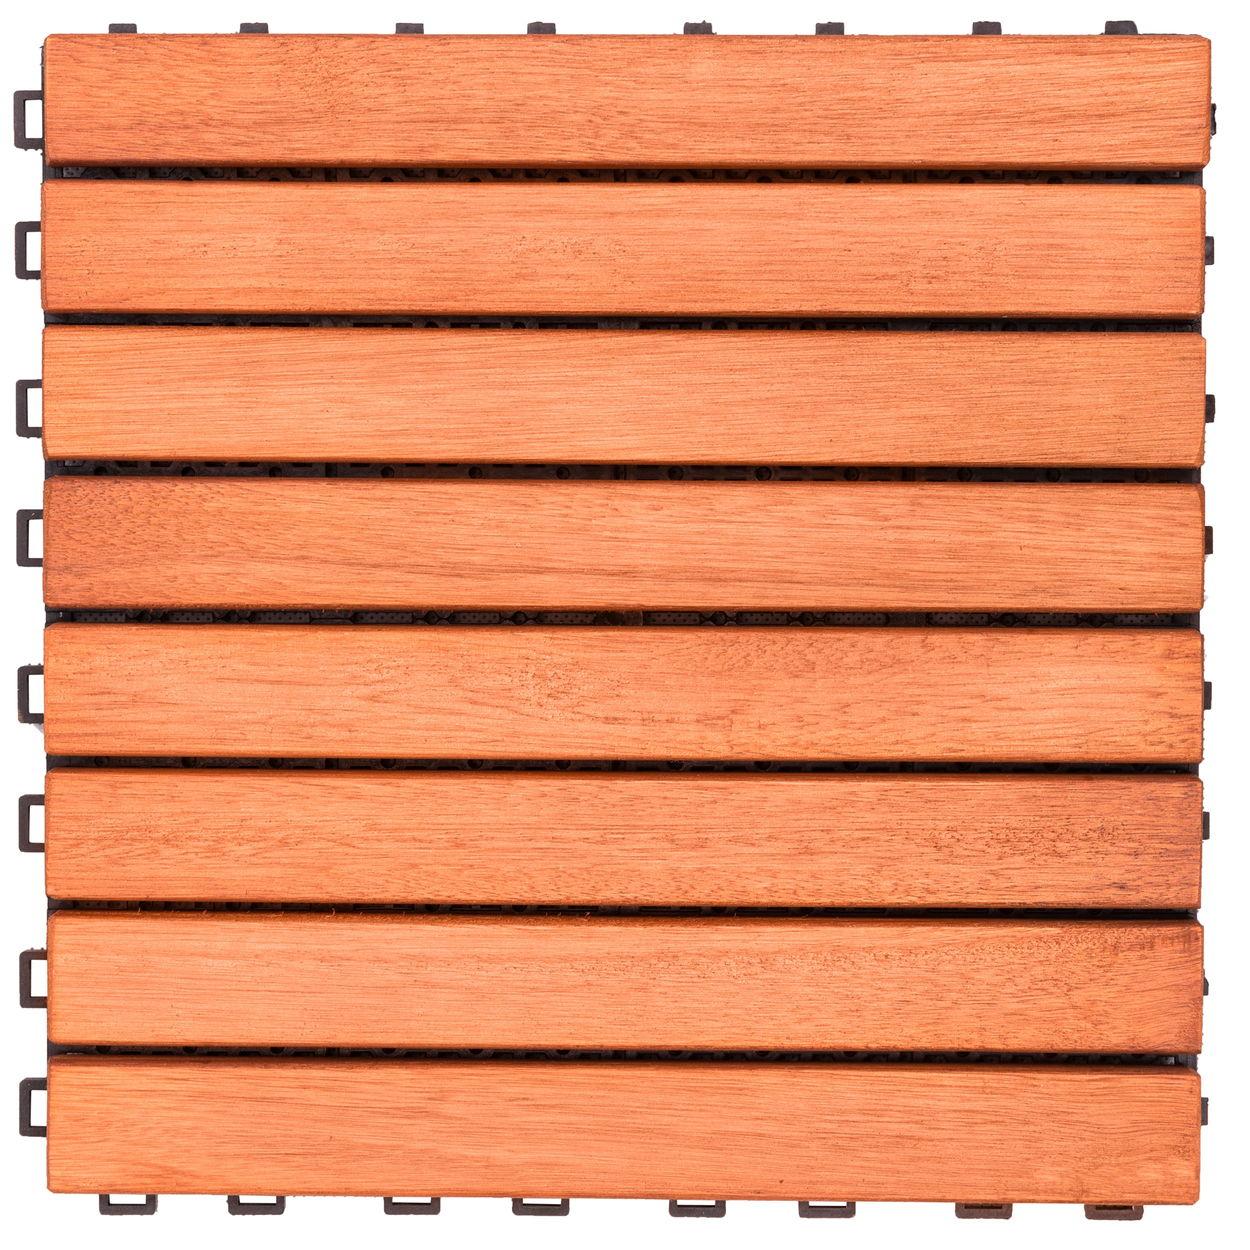 Outdoor Patio 8-Slat Eucalyptus Interlocking Deck Tile (Set of 10 Tiles)